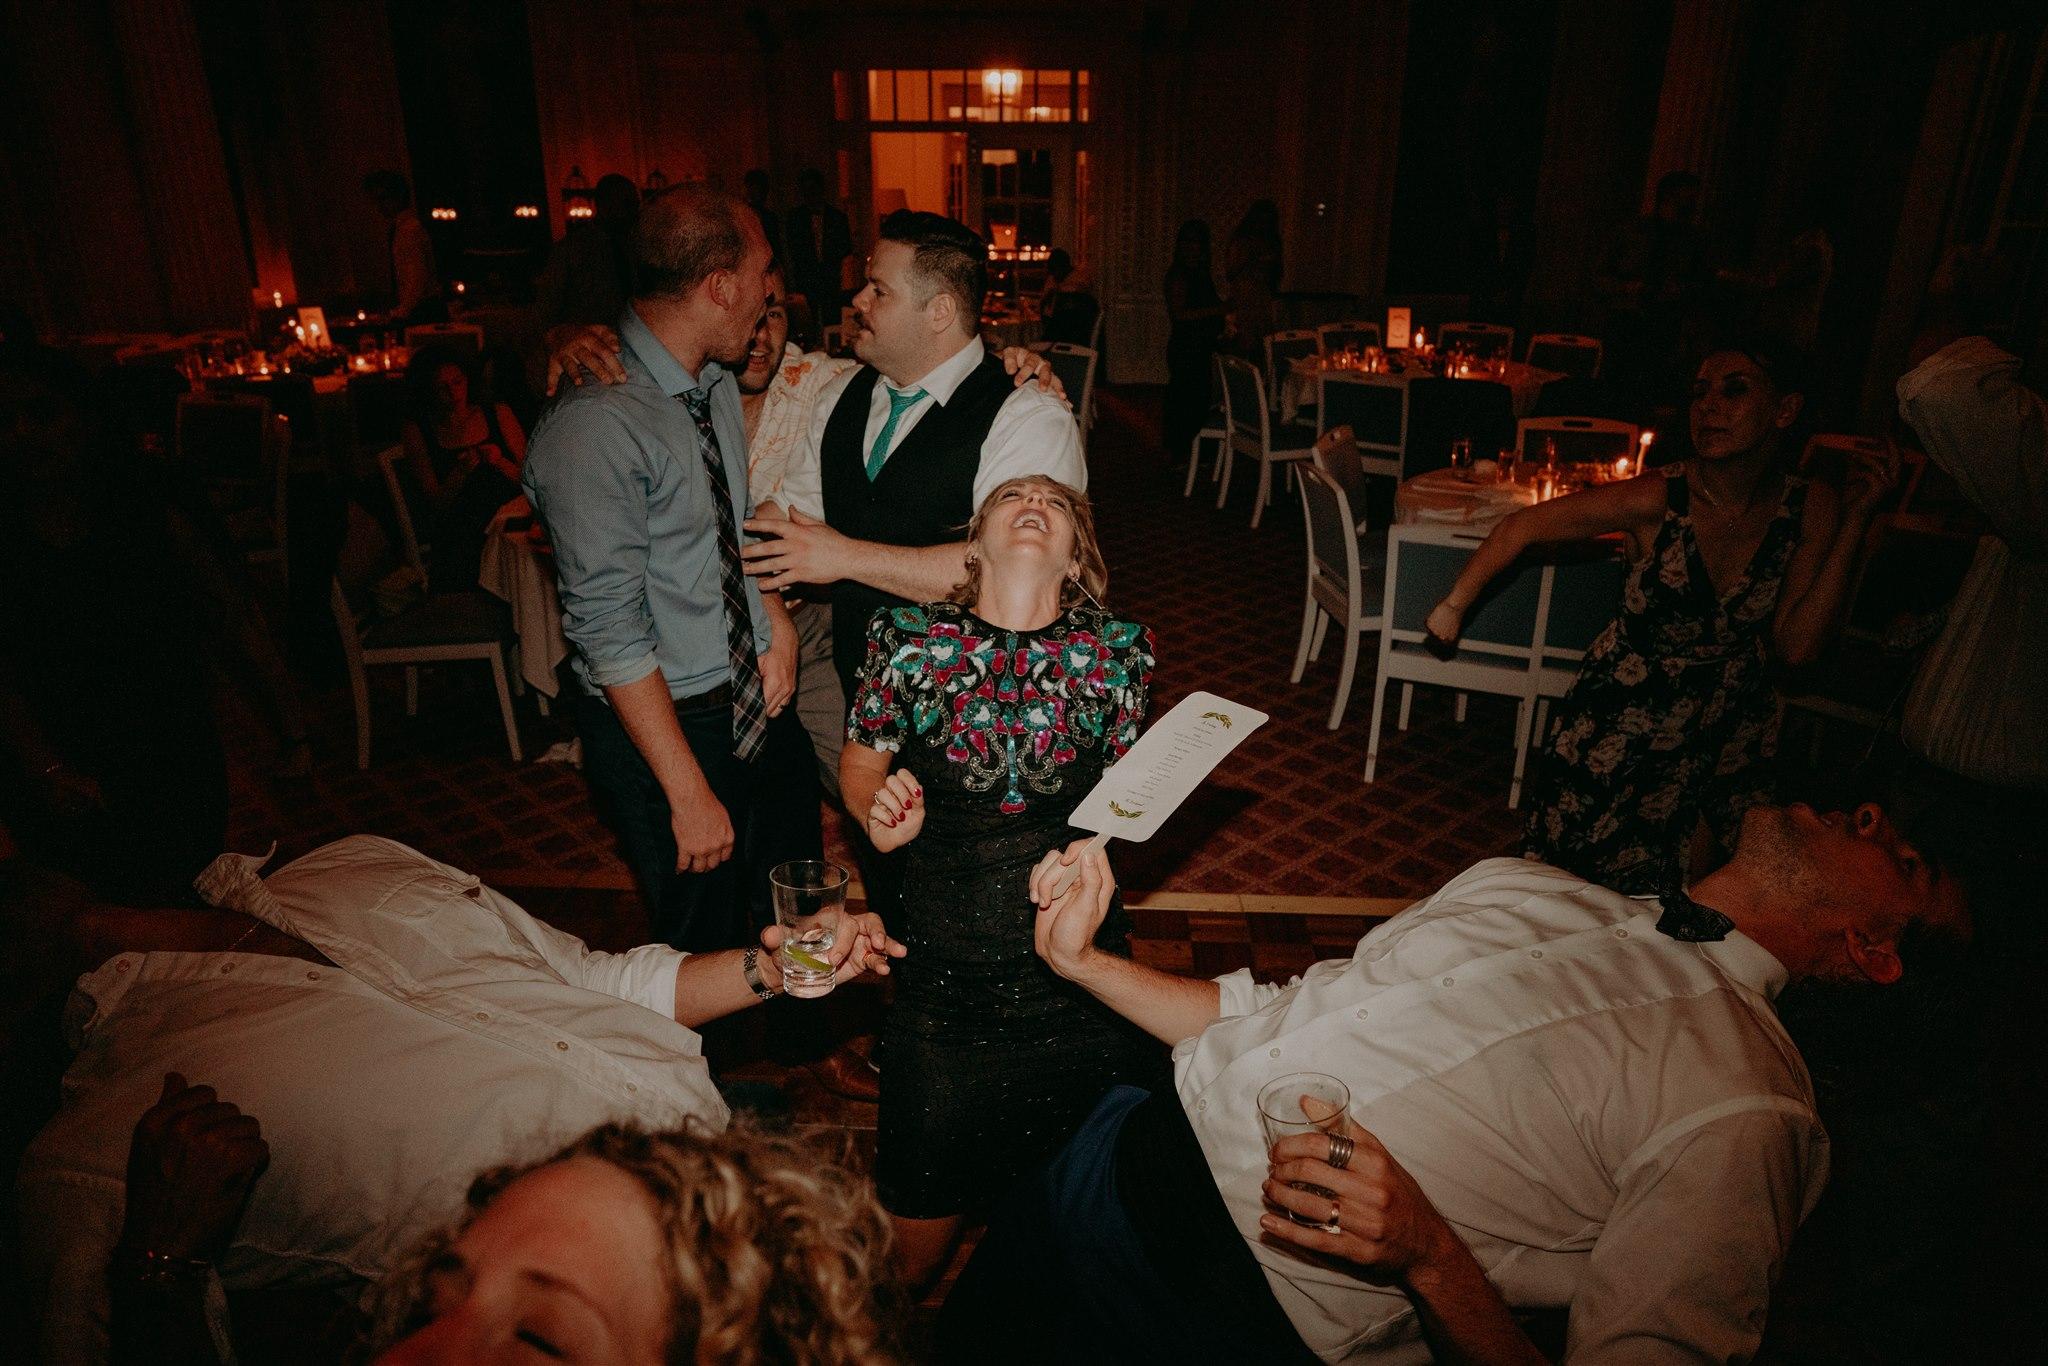 Chellise_Michael_Photography_Hudson_Valley_Wedding_Photographer_Otesaga_Hotel-6265.jpg